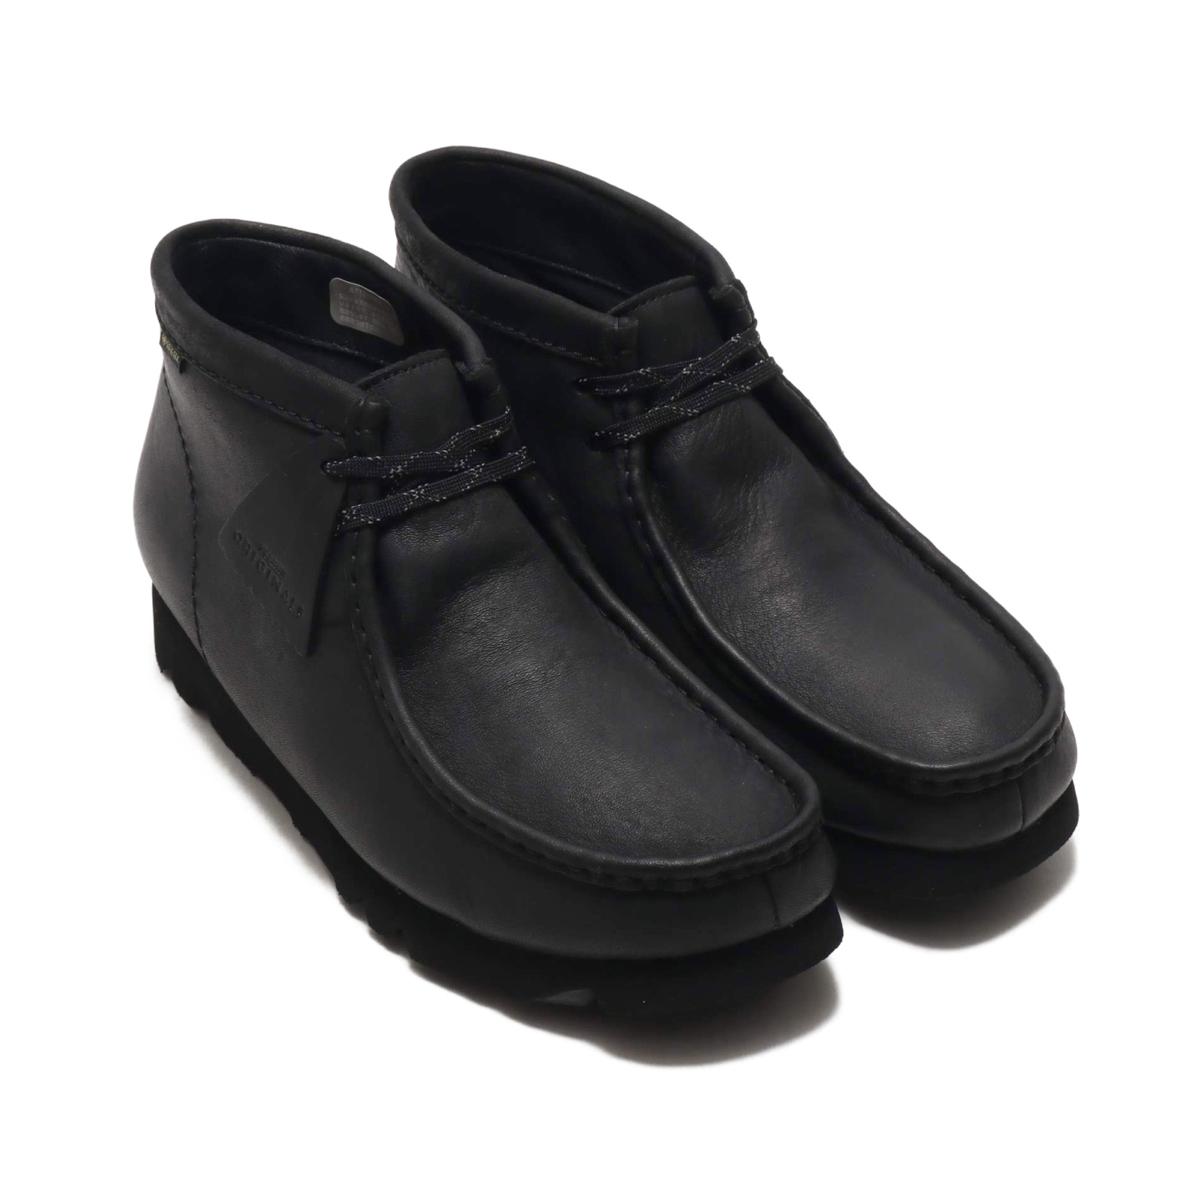 Clarks WALLABEE BT GTX(クラークス ワラビーブーツ GTX)BLACK LEATHER【メンズ ブーツ】19FA-I